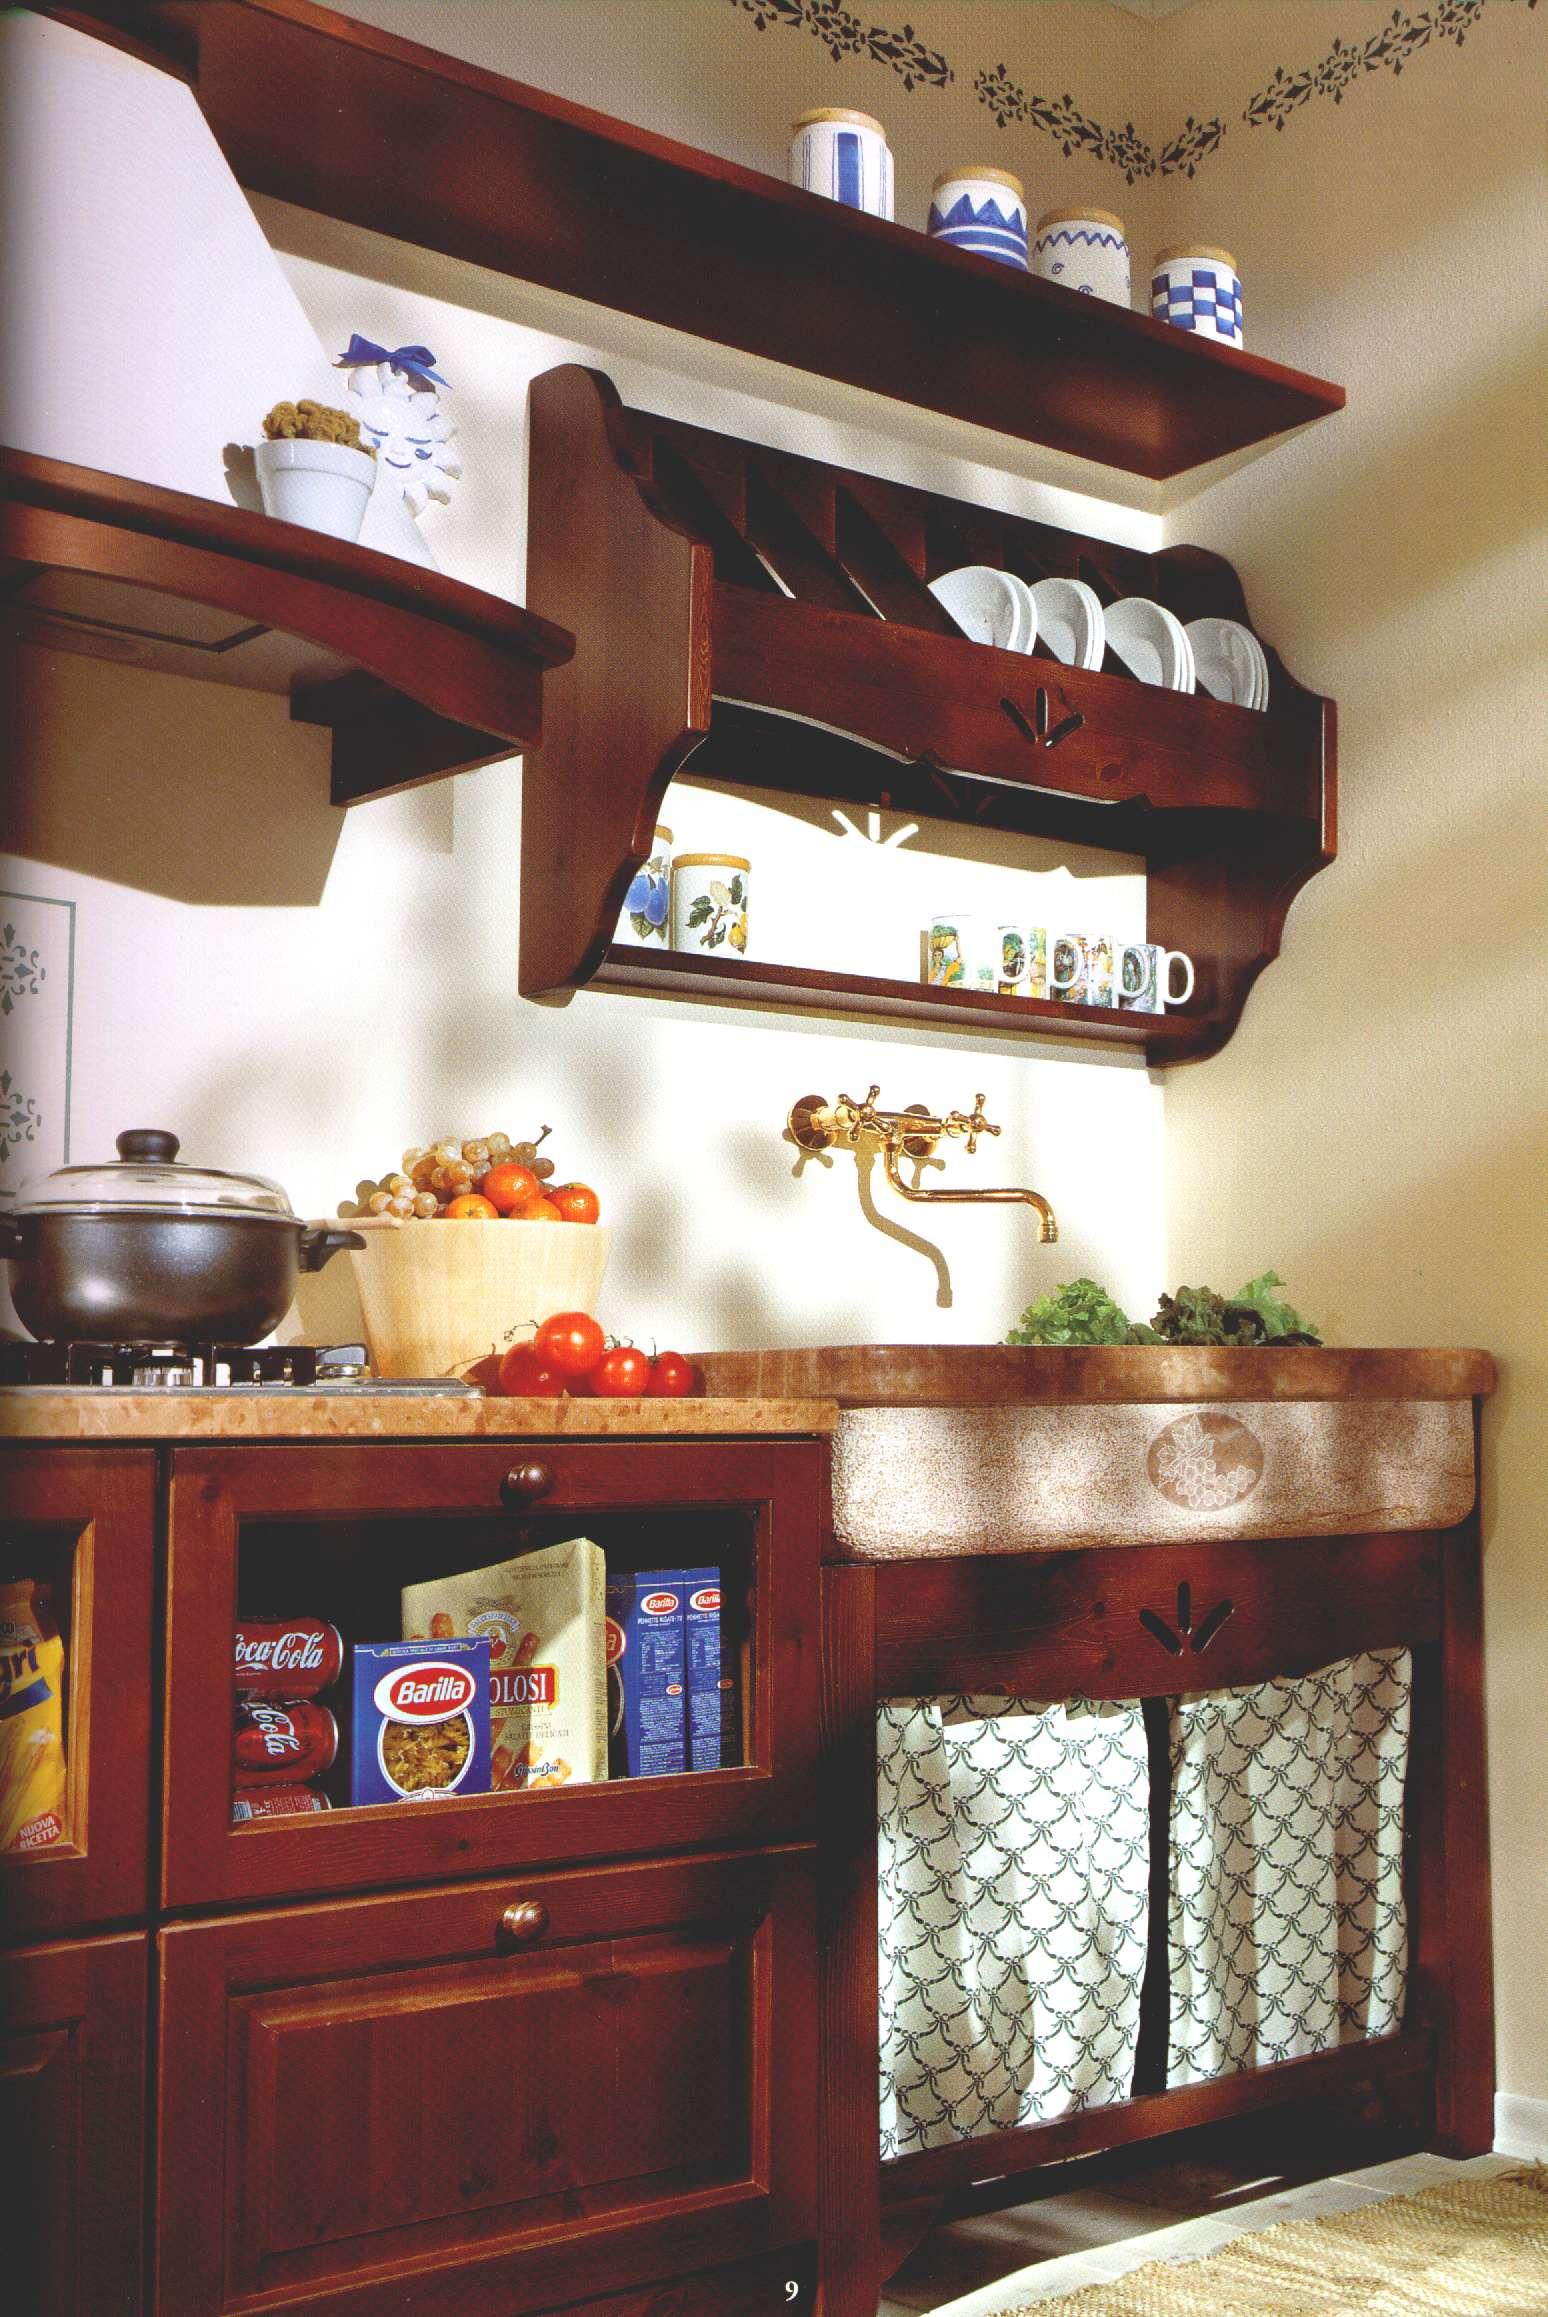 Cucina Rustica In Pietra: ... cucine in travertino, immagini marmo ...